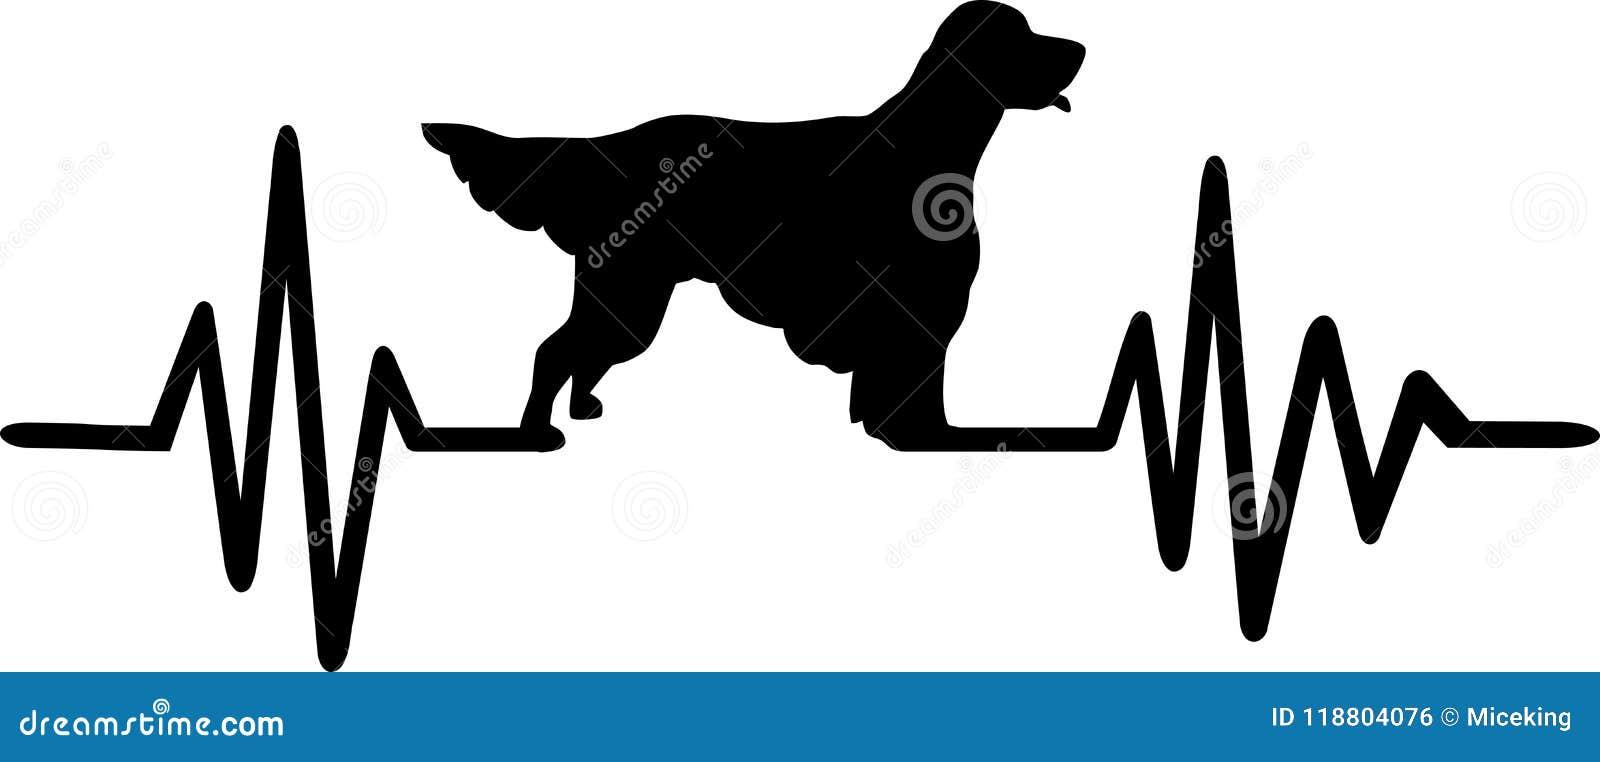 ebb16a2b1a336 English Setter heartbeat stock vector. Illustration of animal ...